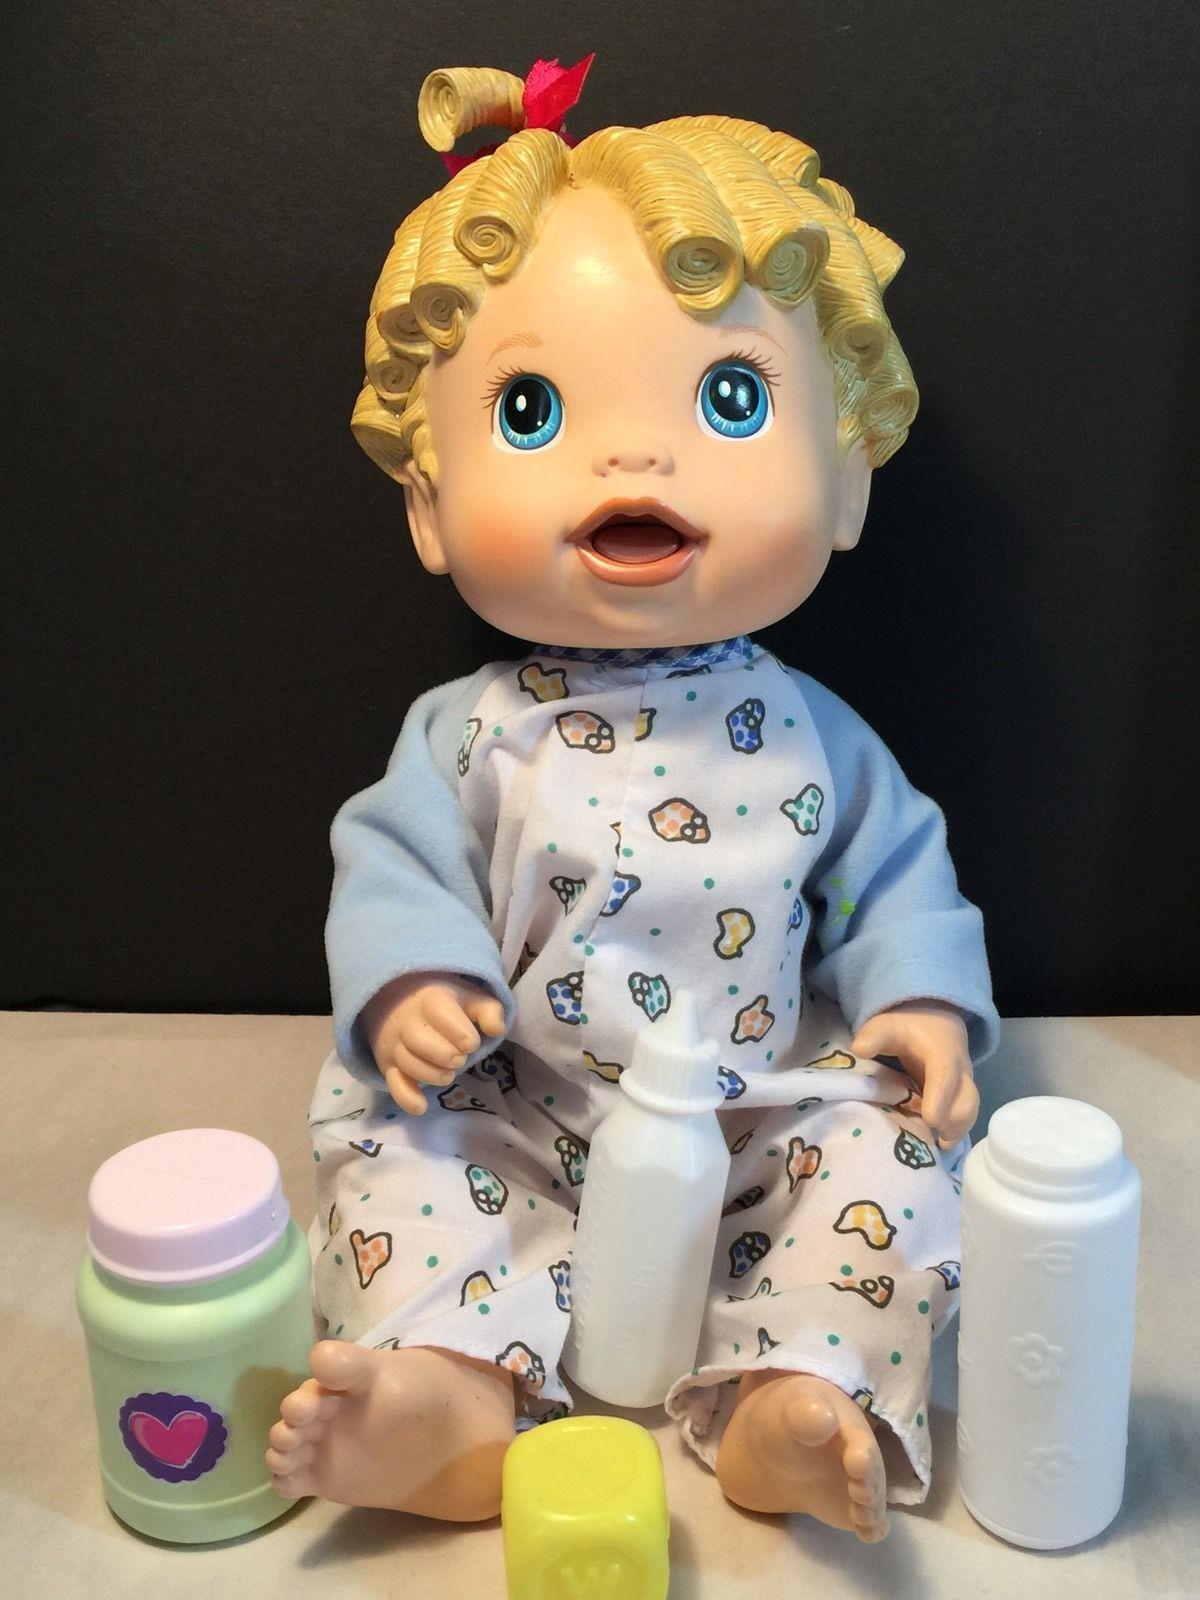 Hasbro 2009 Baby Alive Baby All Gone Doll   eBay